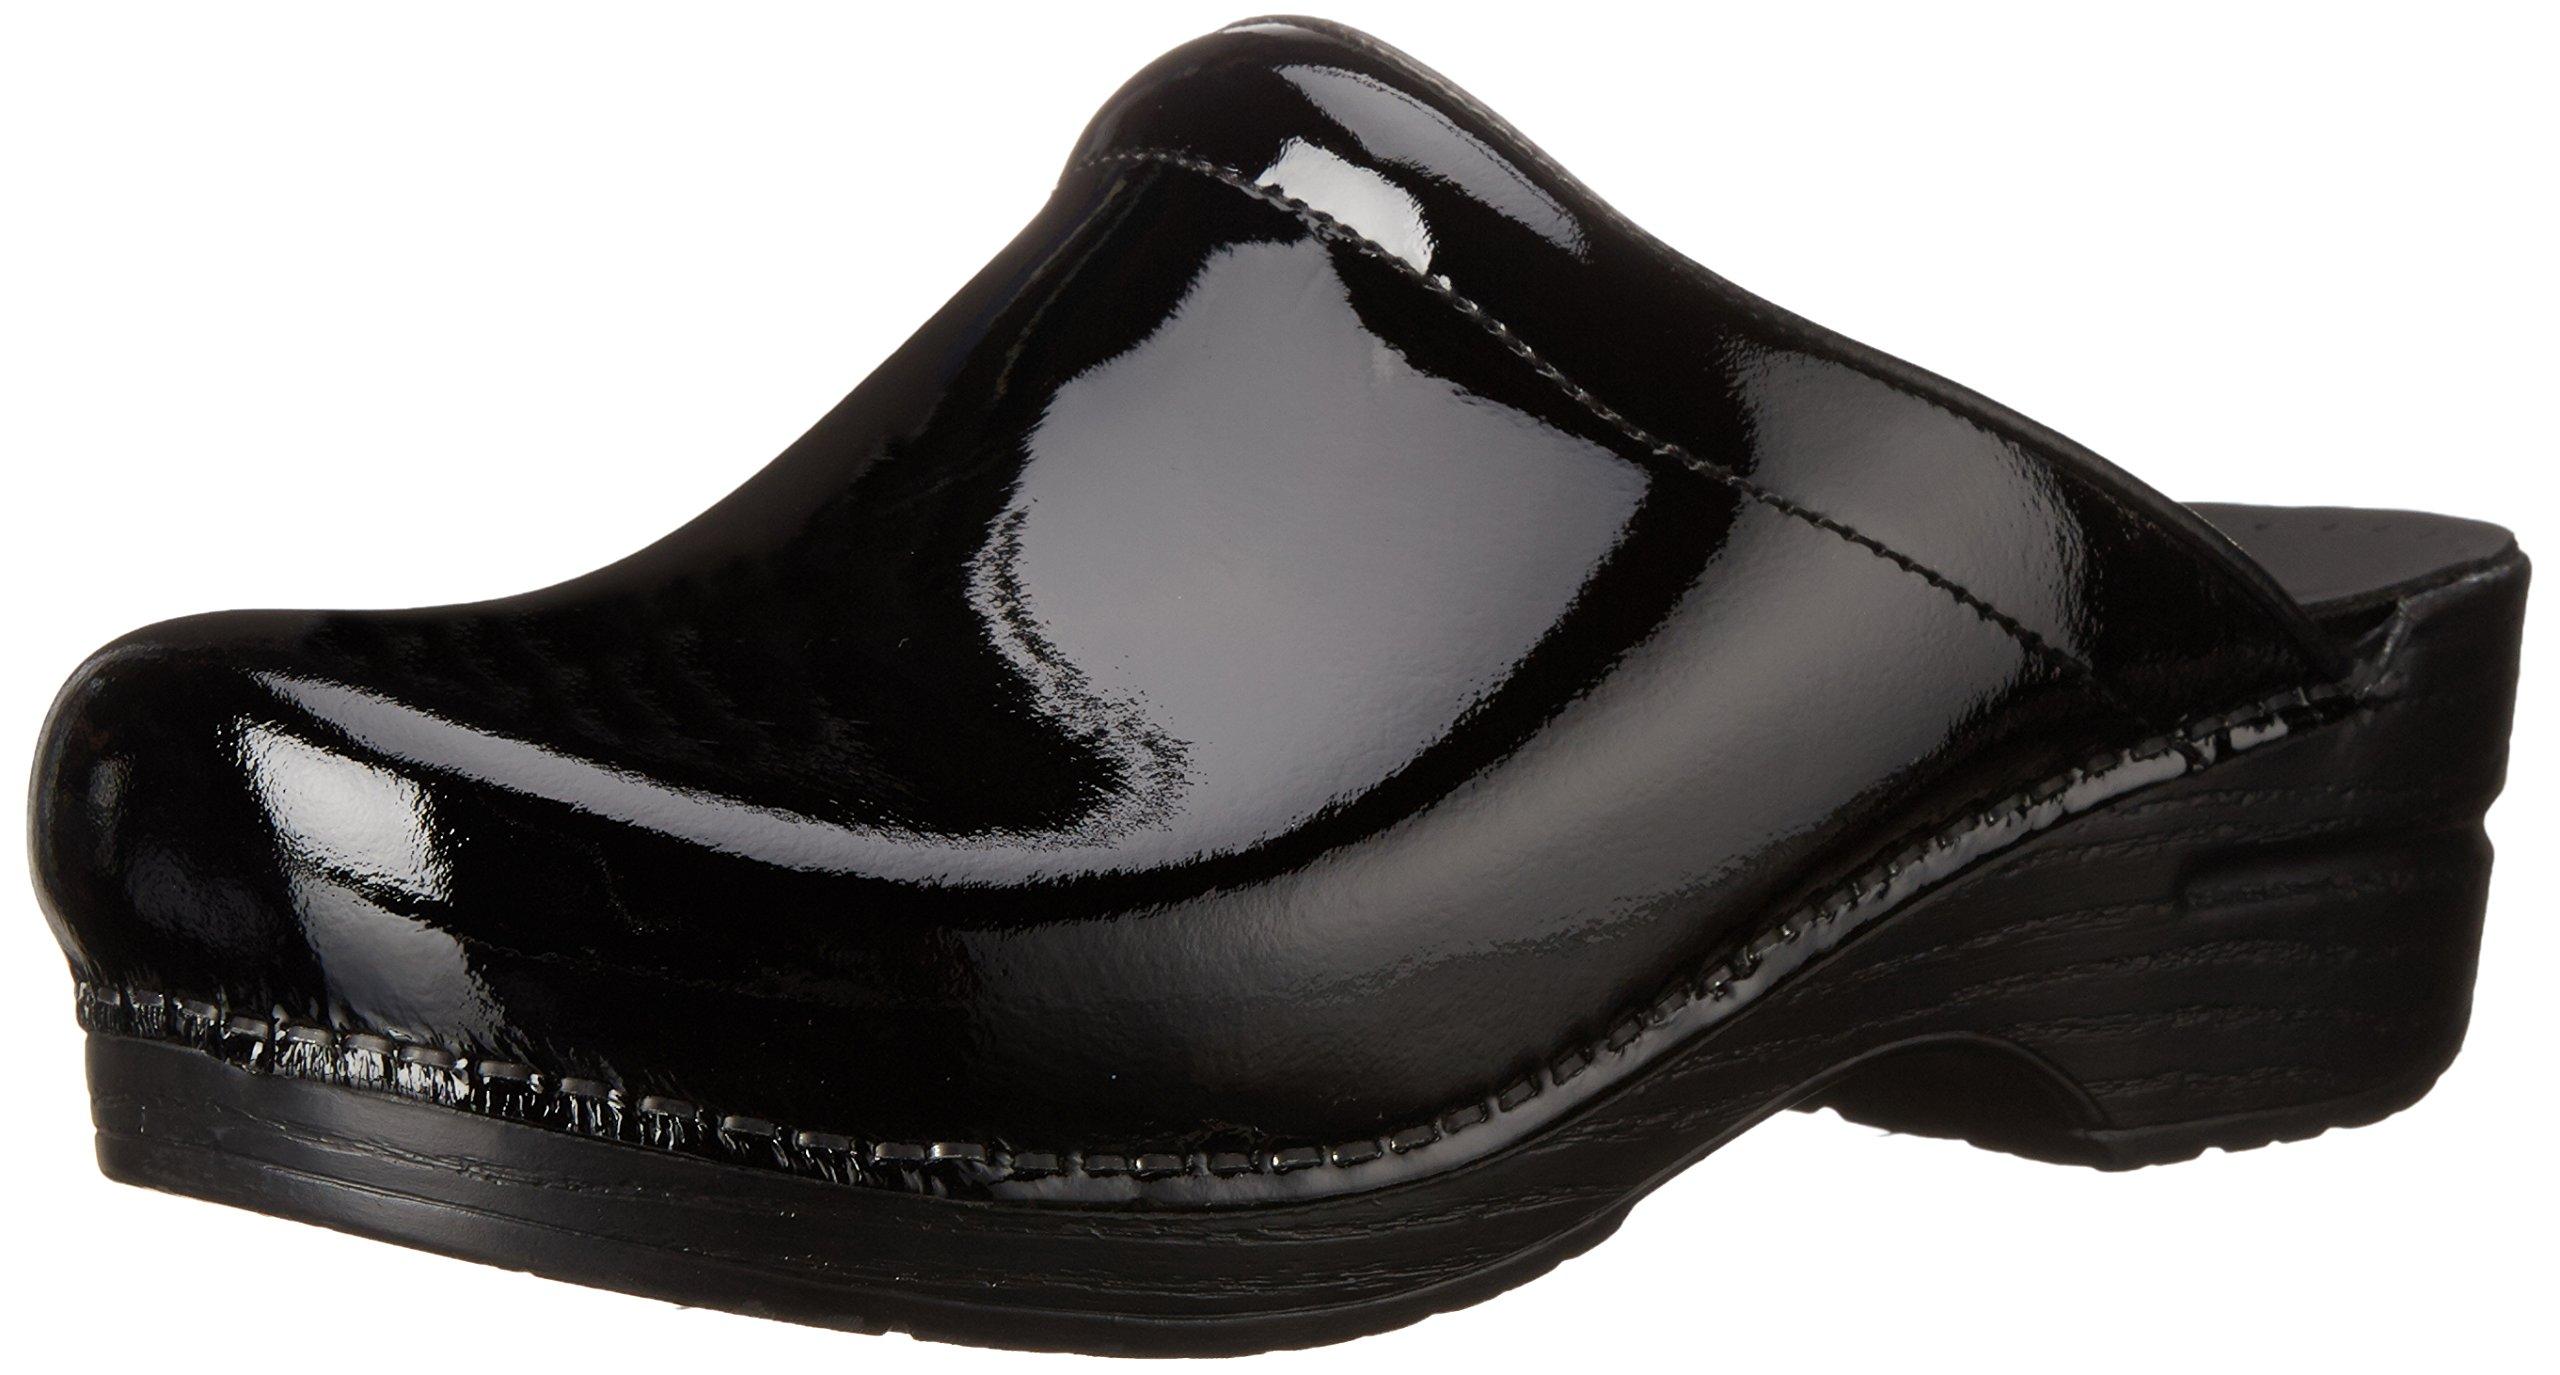 Dansko Women's Sonja Patent Leather Clog,Black,40 EU / 9.5-10 B(M) US